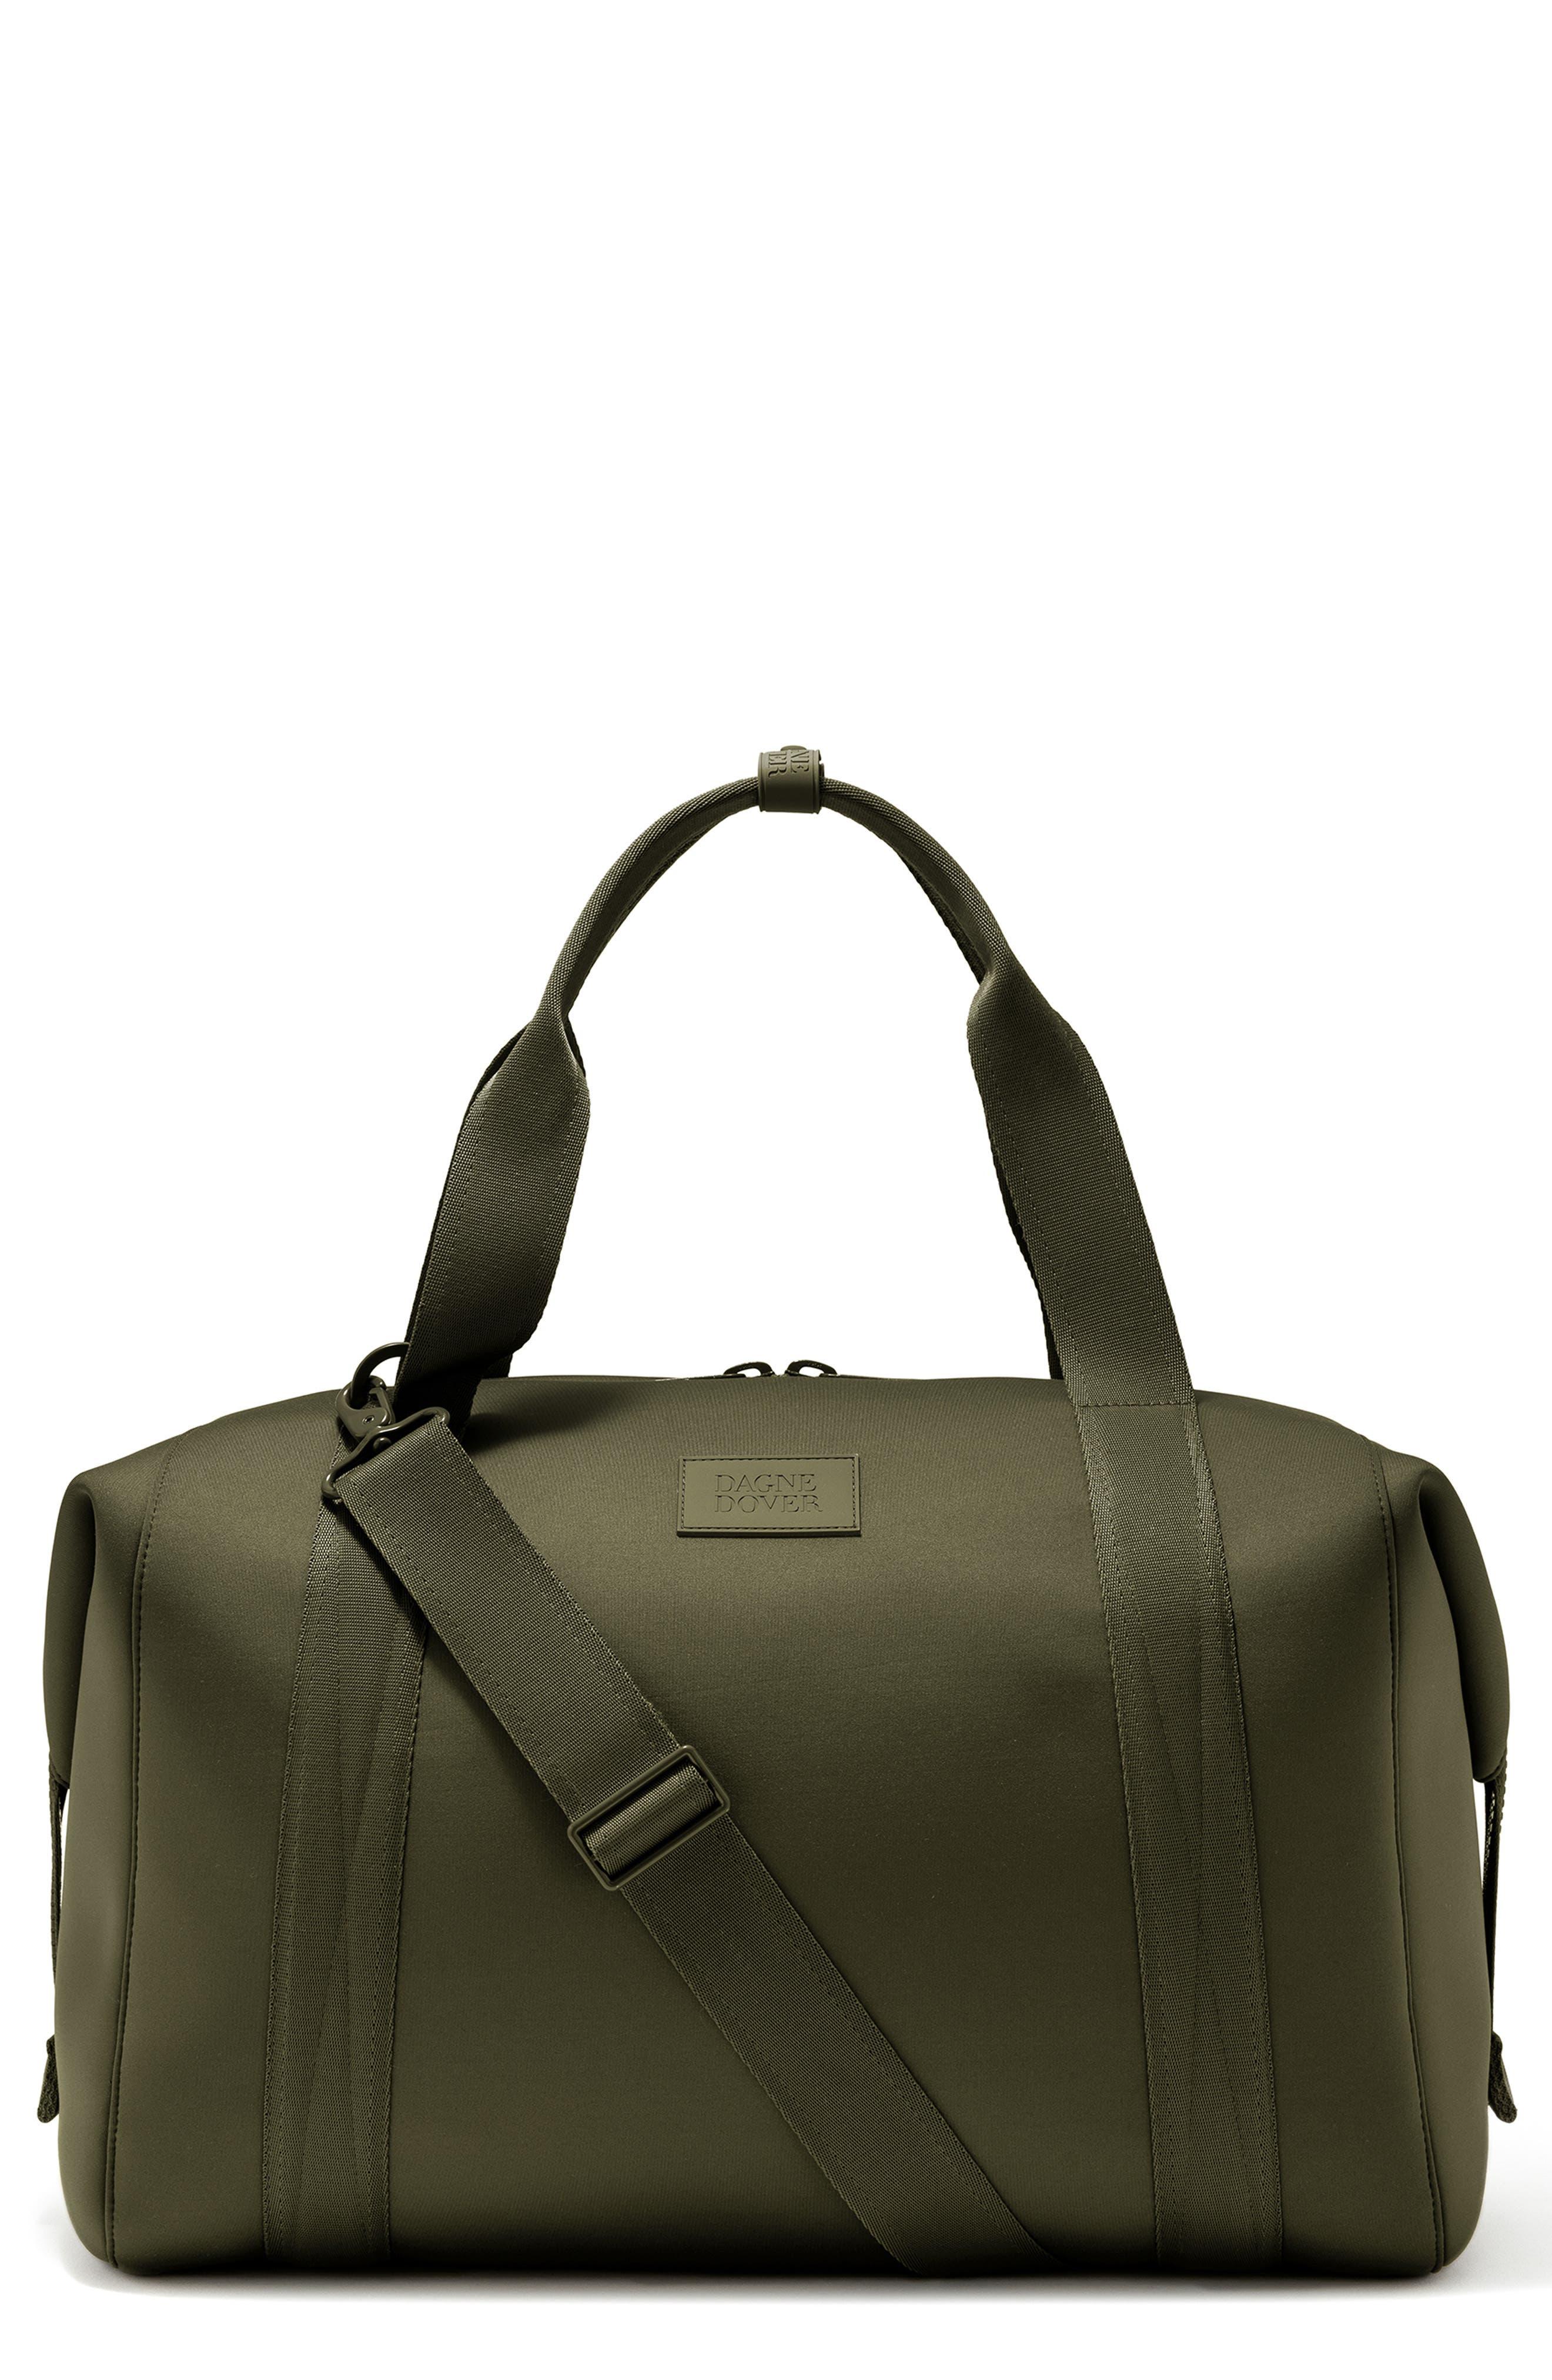 DAGNE DOVER Xl Landon Carryall Duffel Bag - Green in Dark Moss